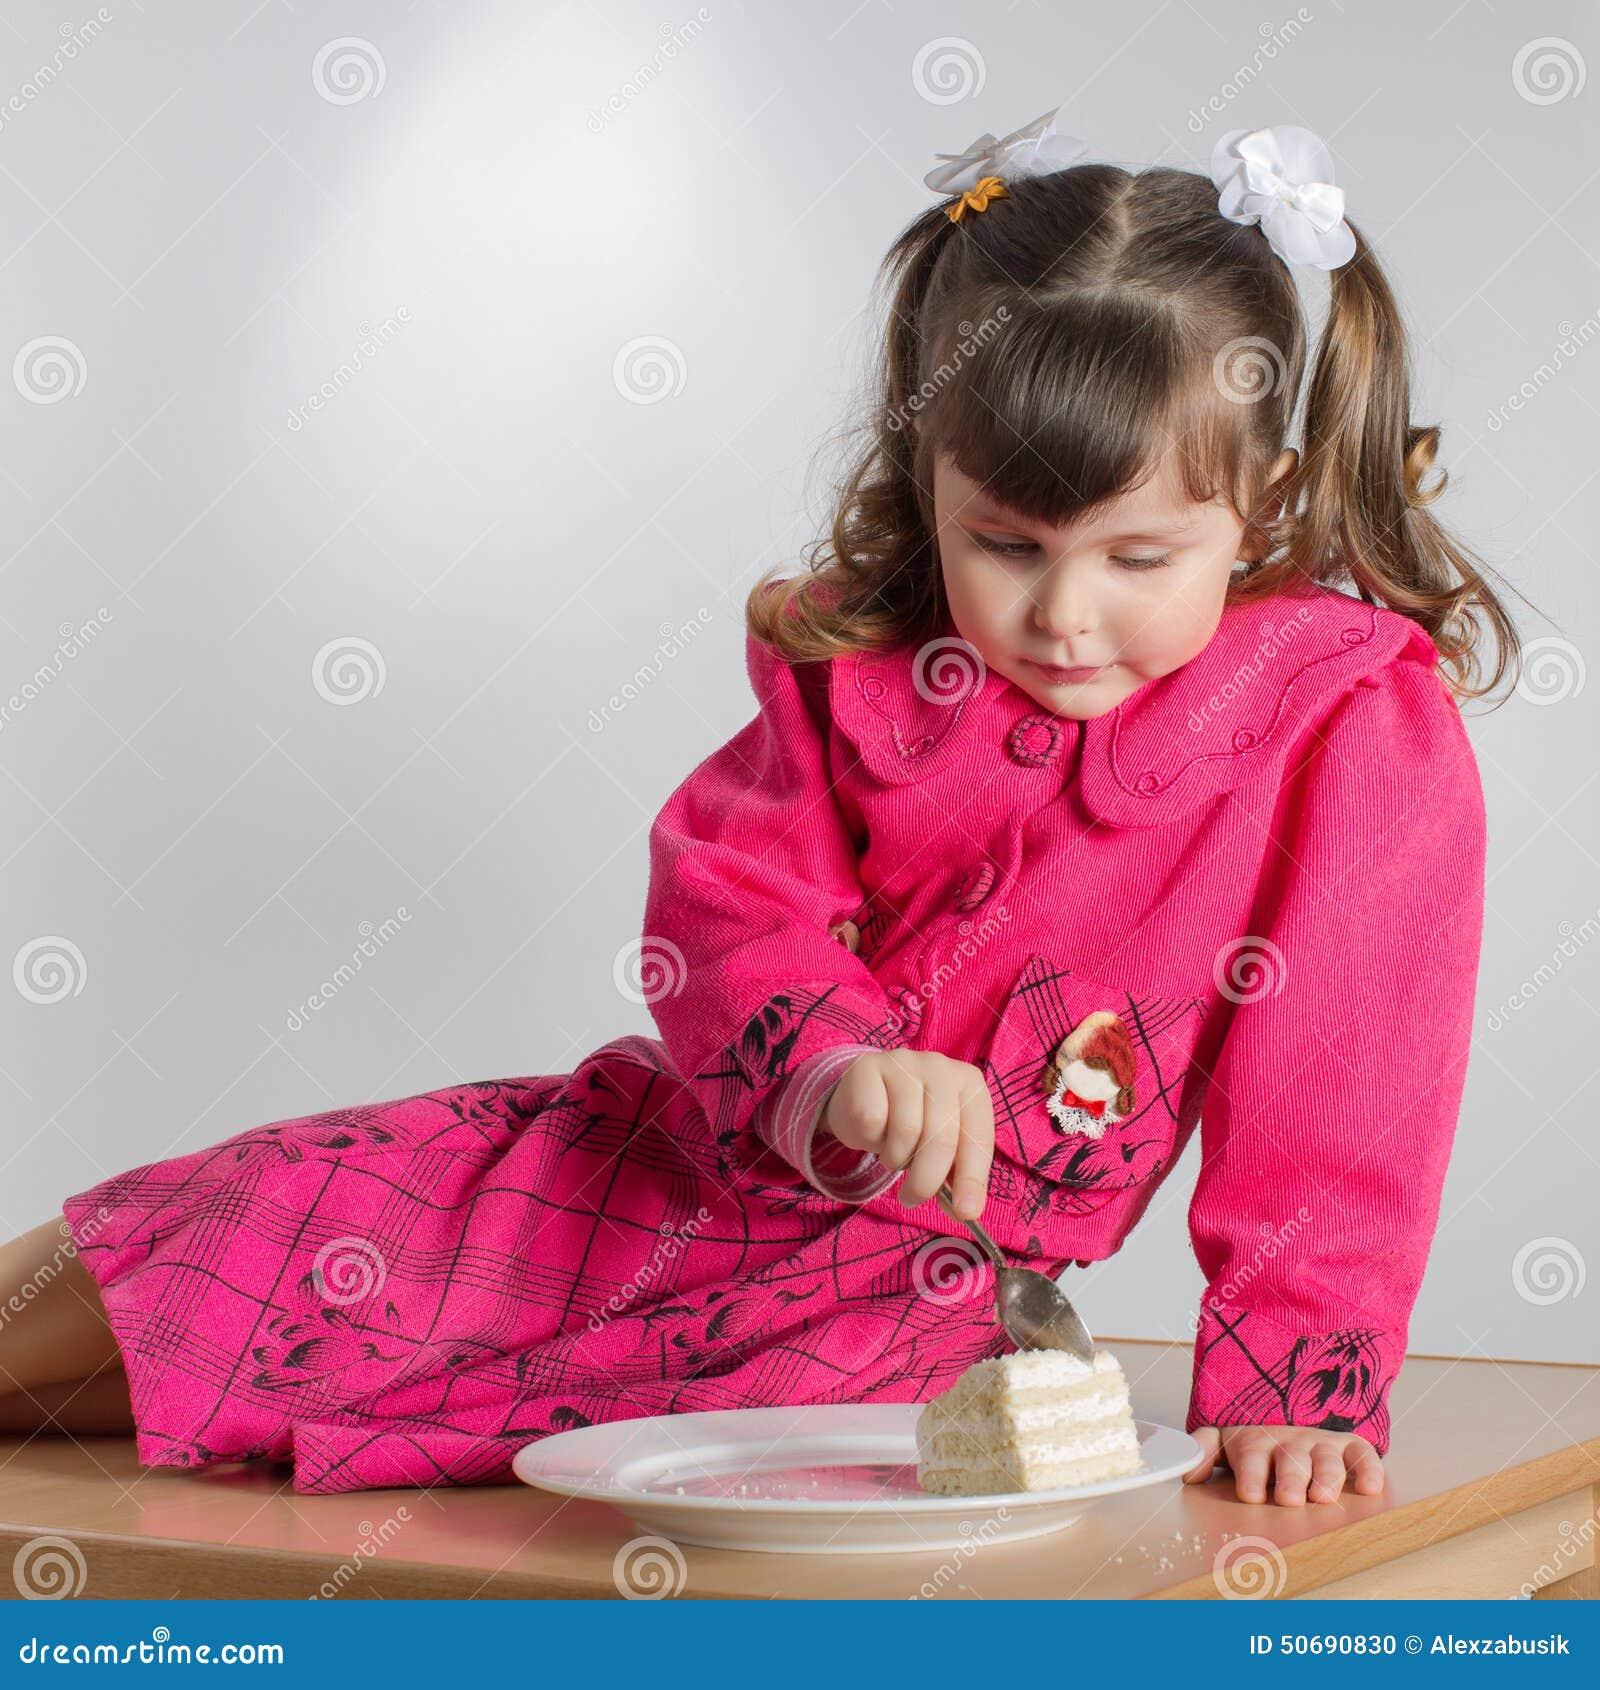 Download 少许吃女孩的点心 库存照片. 图片 包括有 点心, 食物, 淘气的性质, 人员, 嬉戏, 婴孩, 粉红色 - 50690830